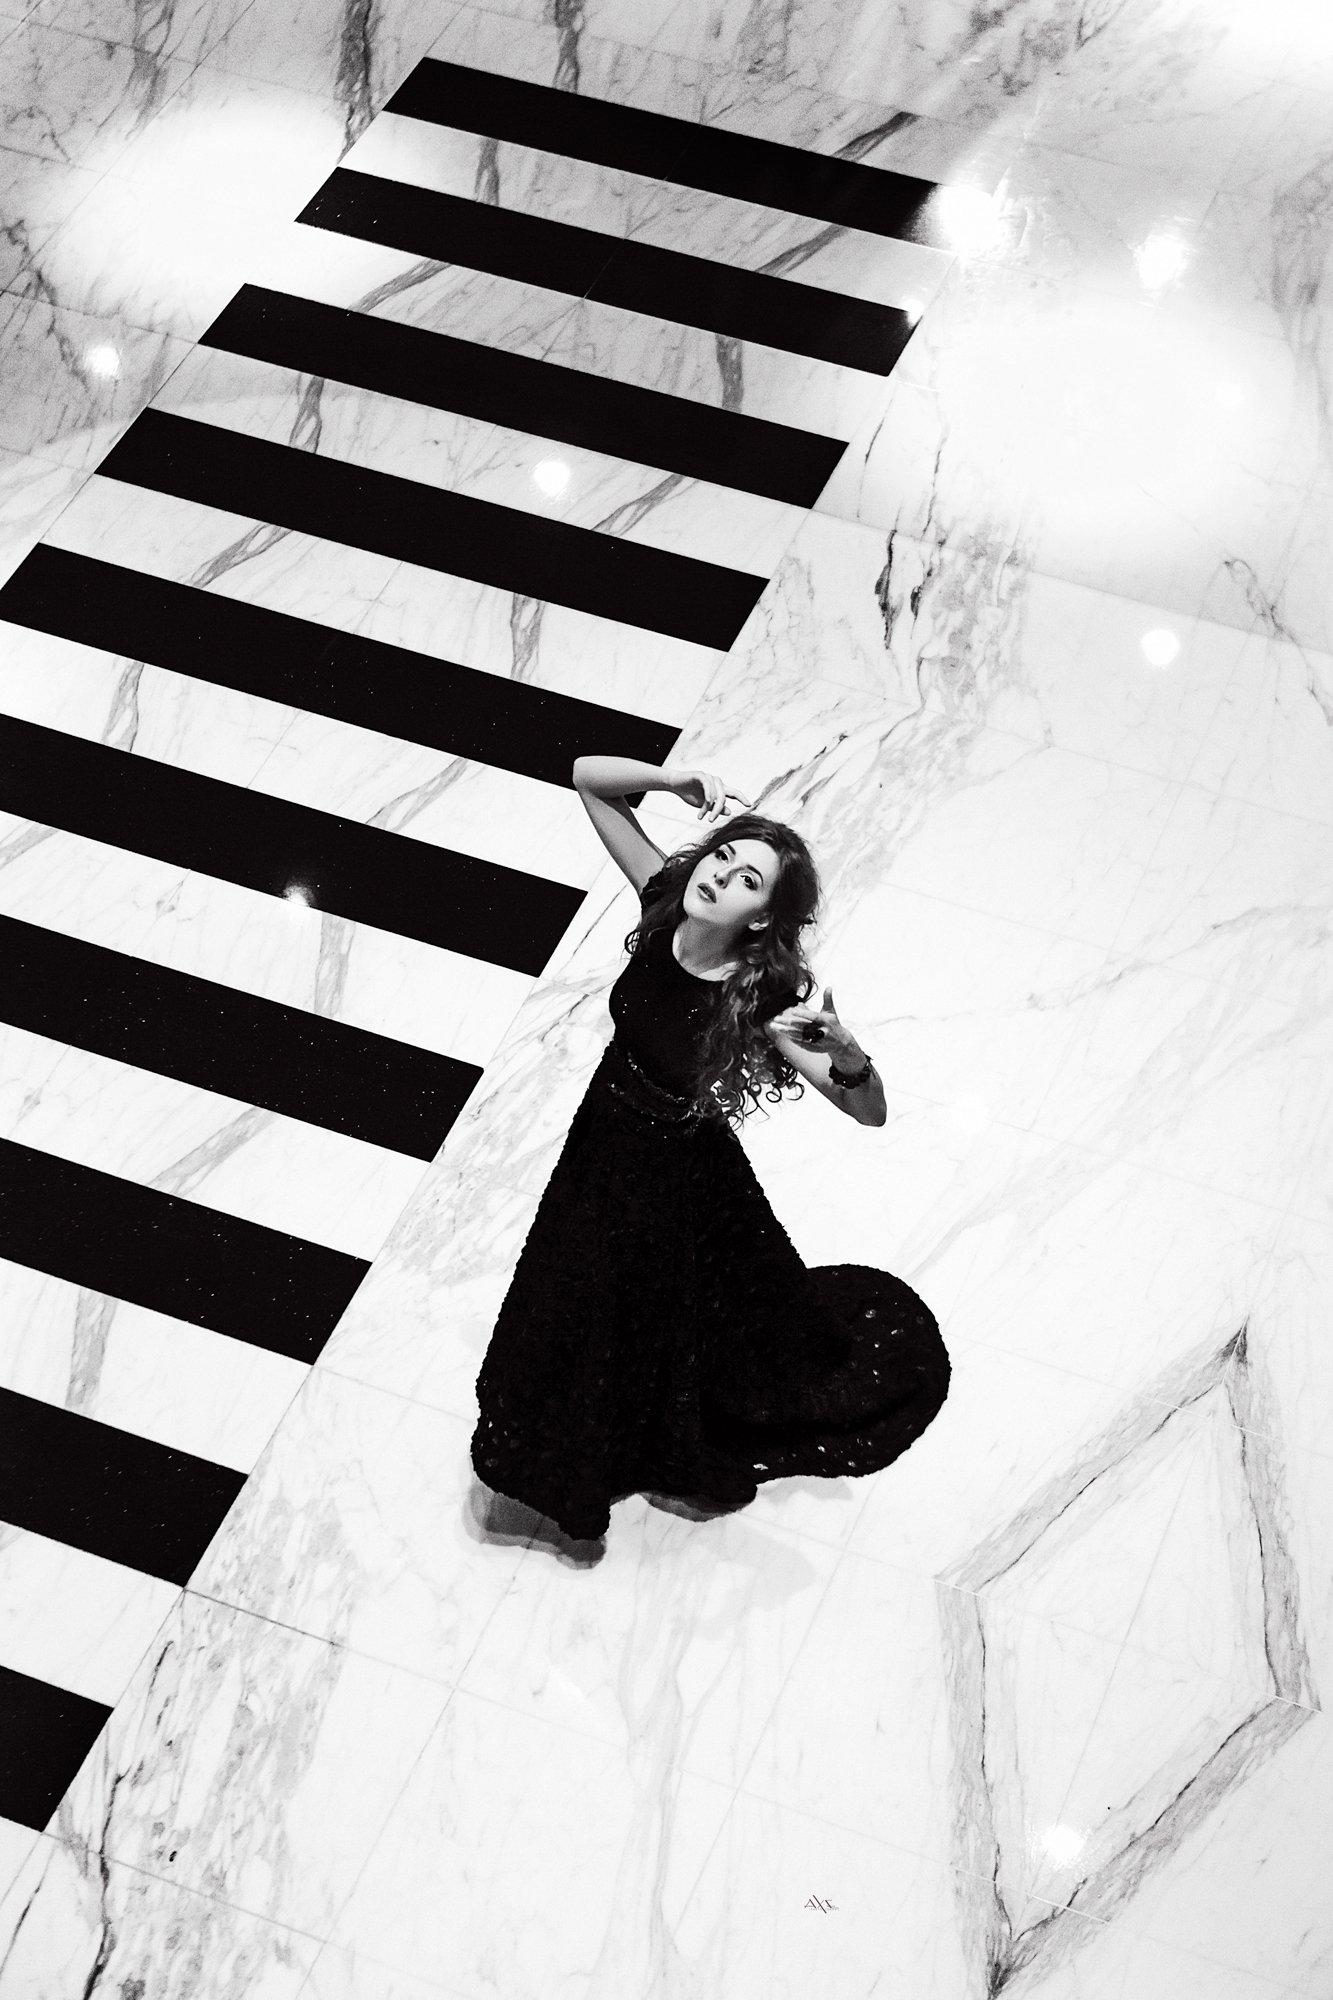 woman, portrait, fashion, black and white, Руслан Болгов (Axe)